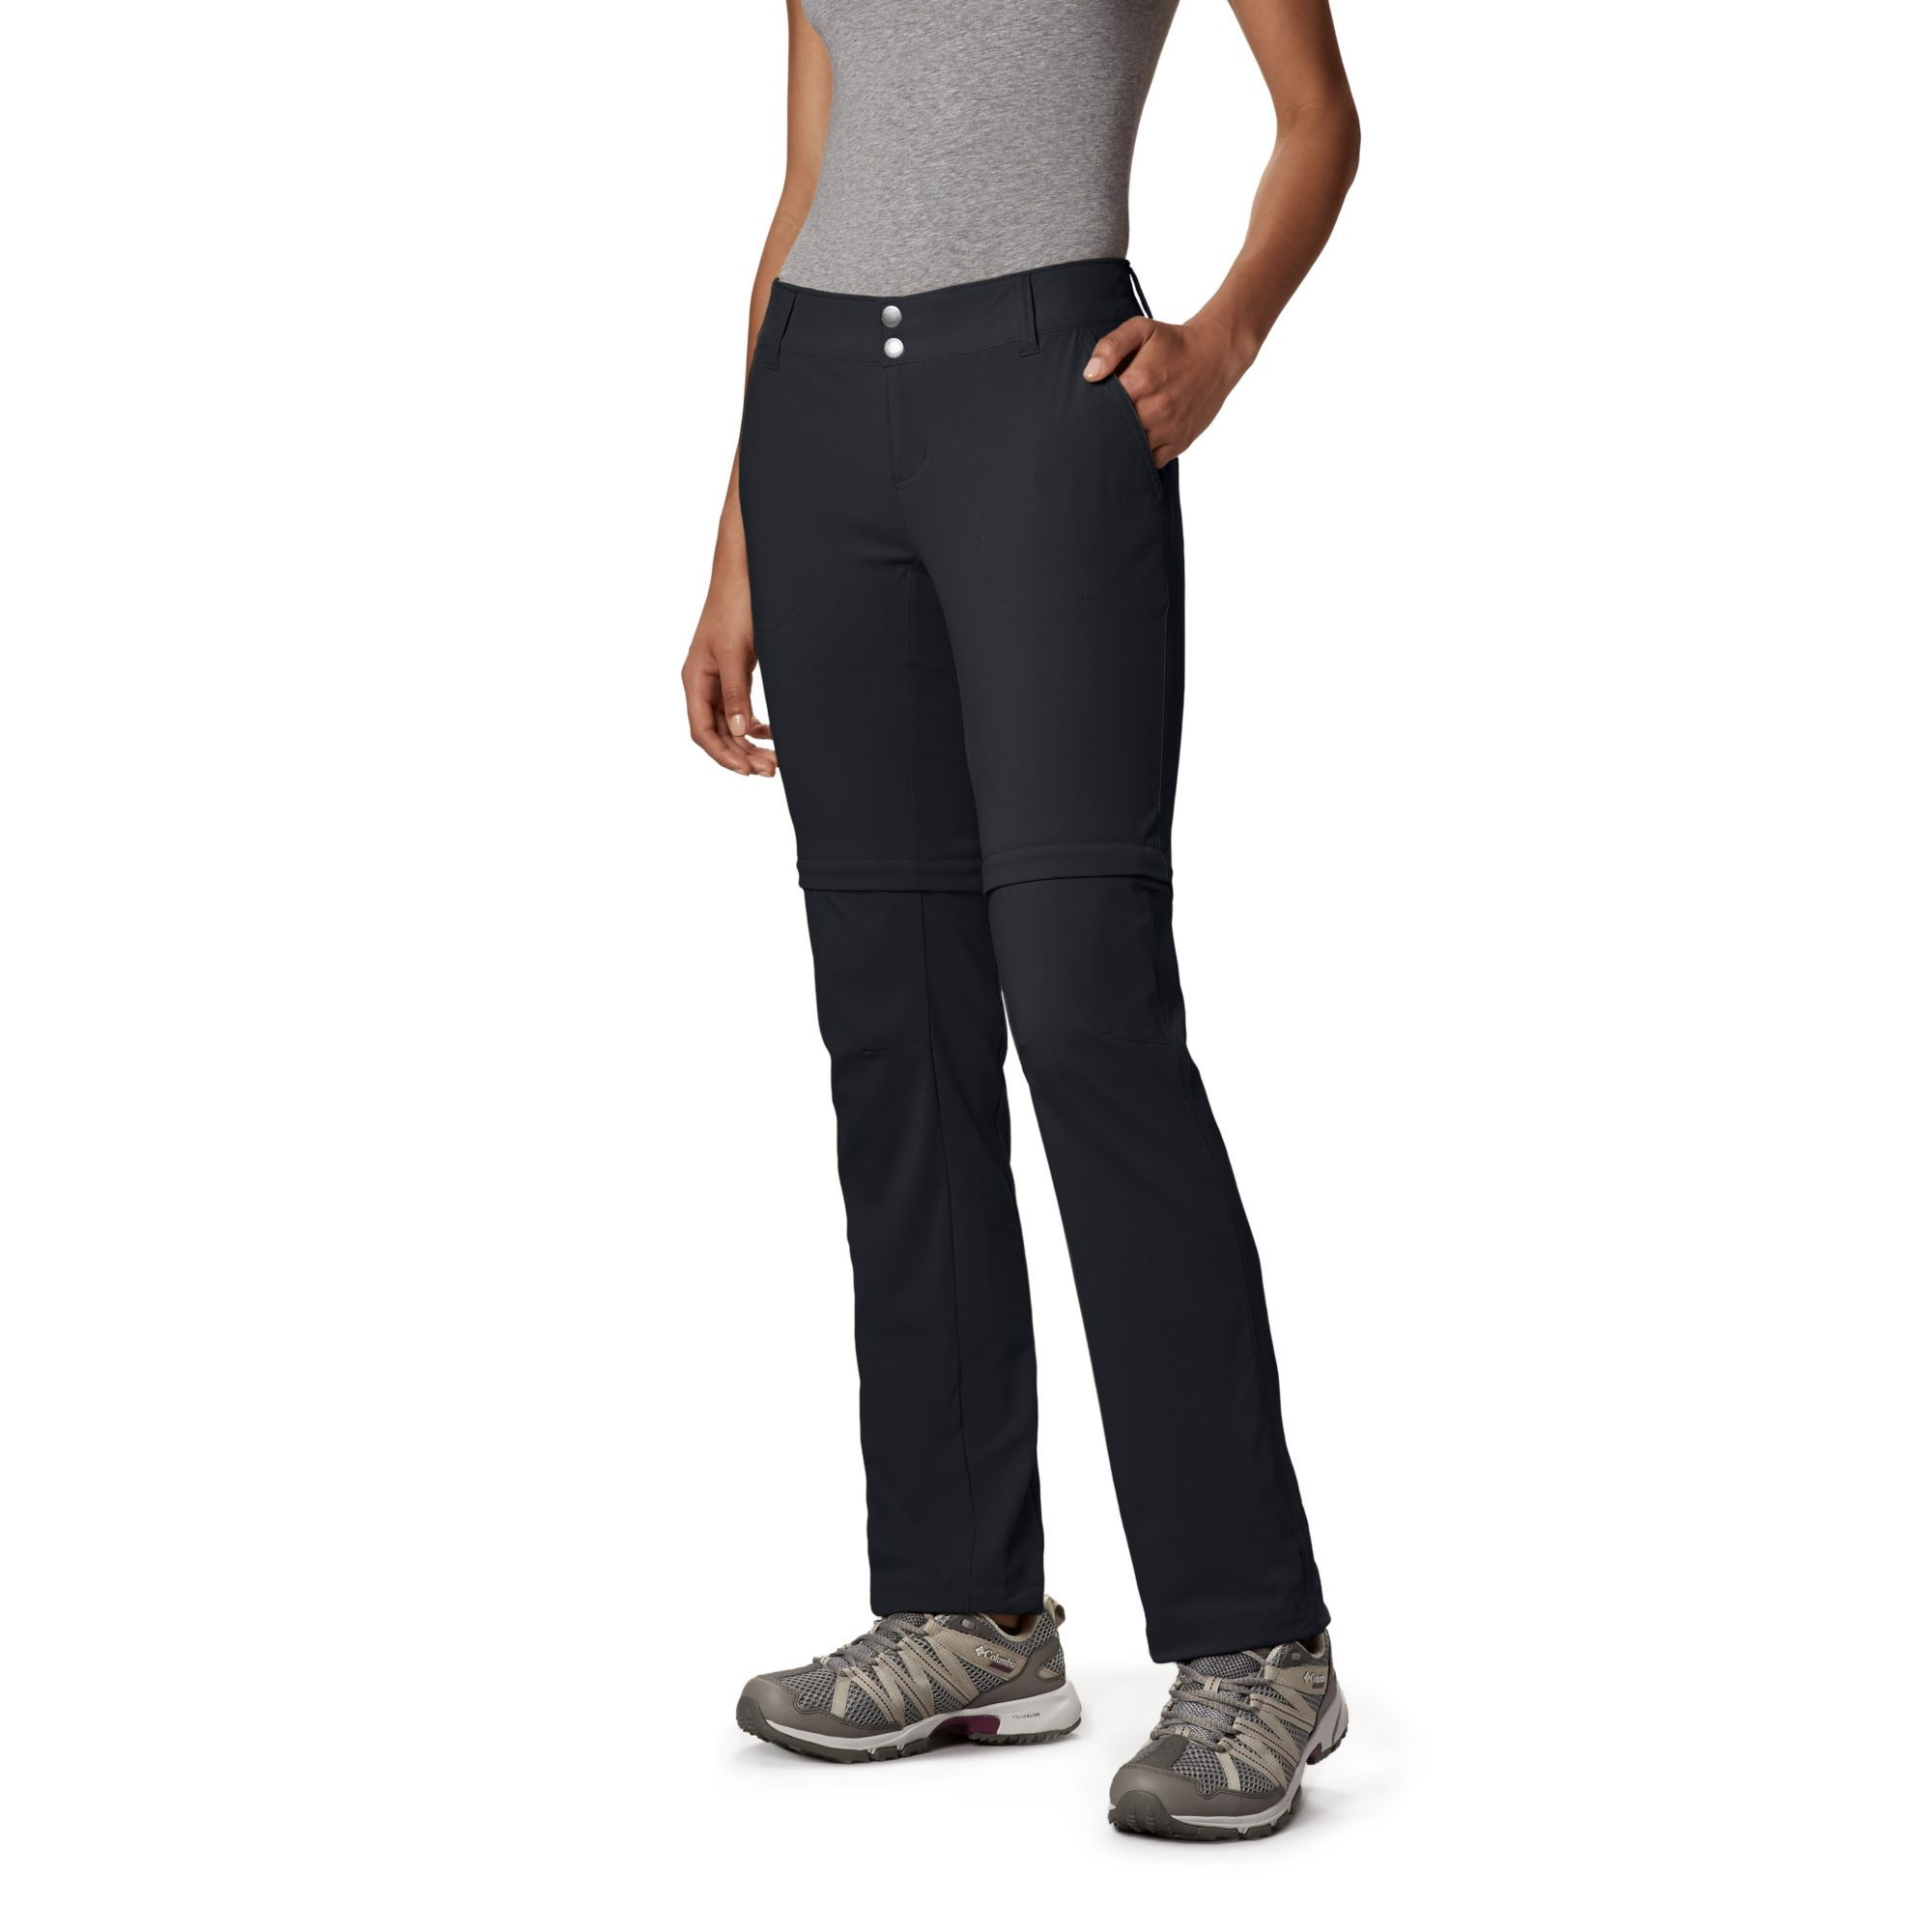 Columbia Saturday Trail II Convertible Pant - Pantalon randonnée femme